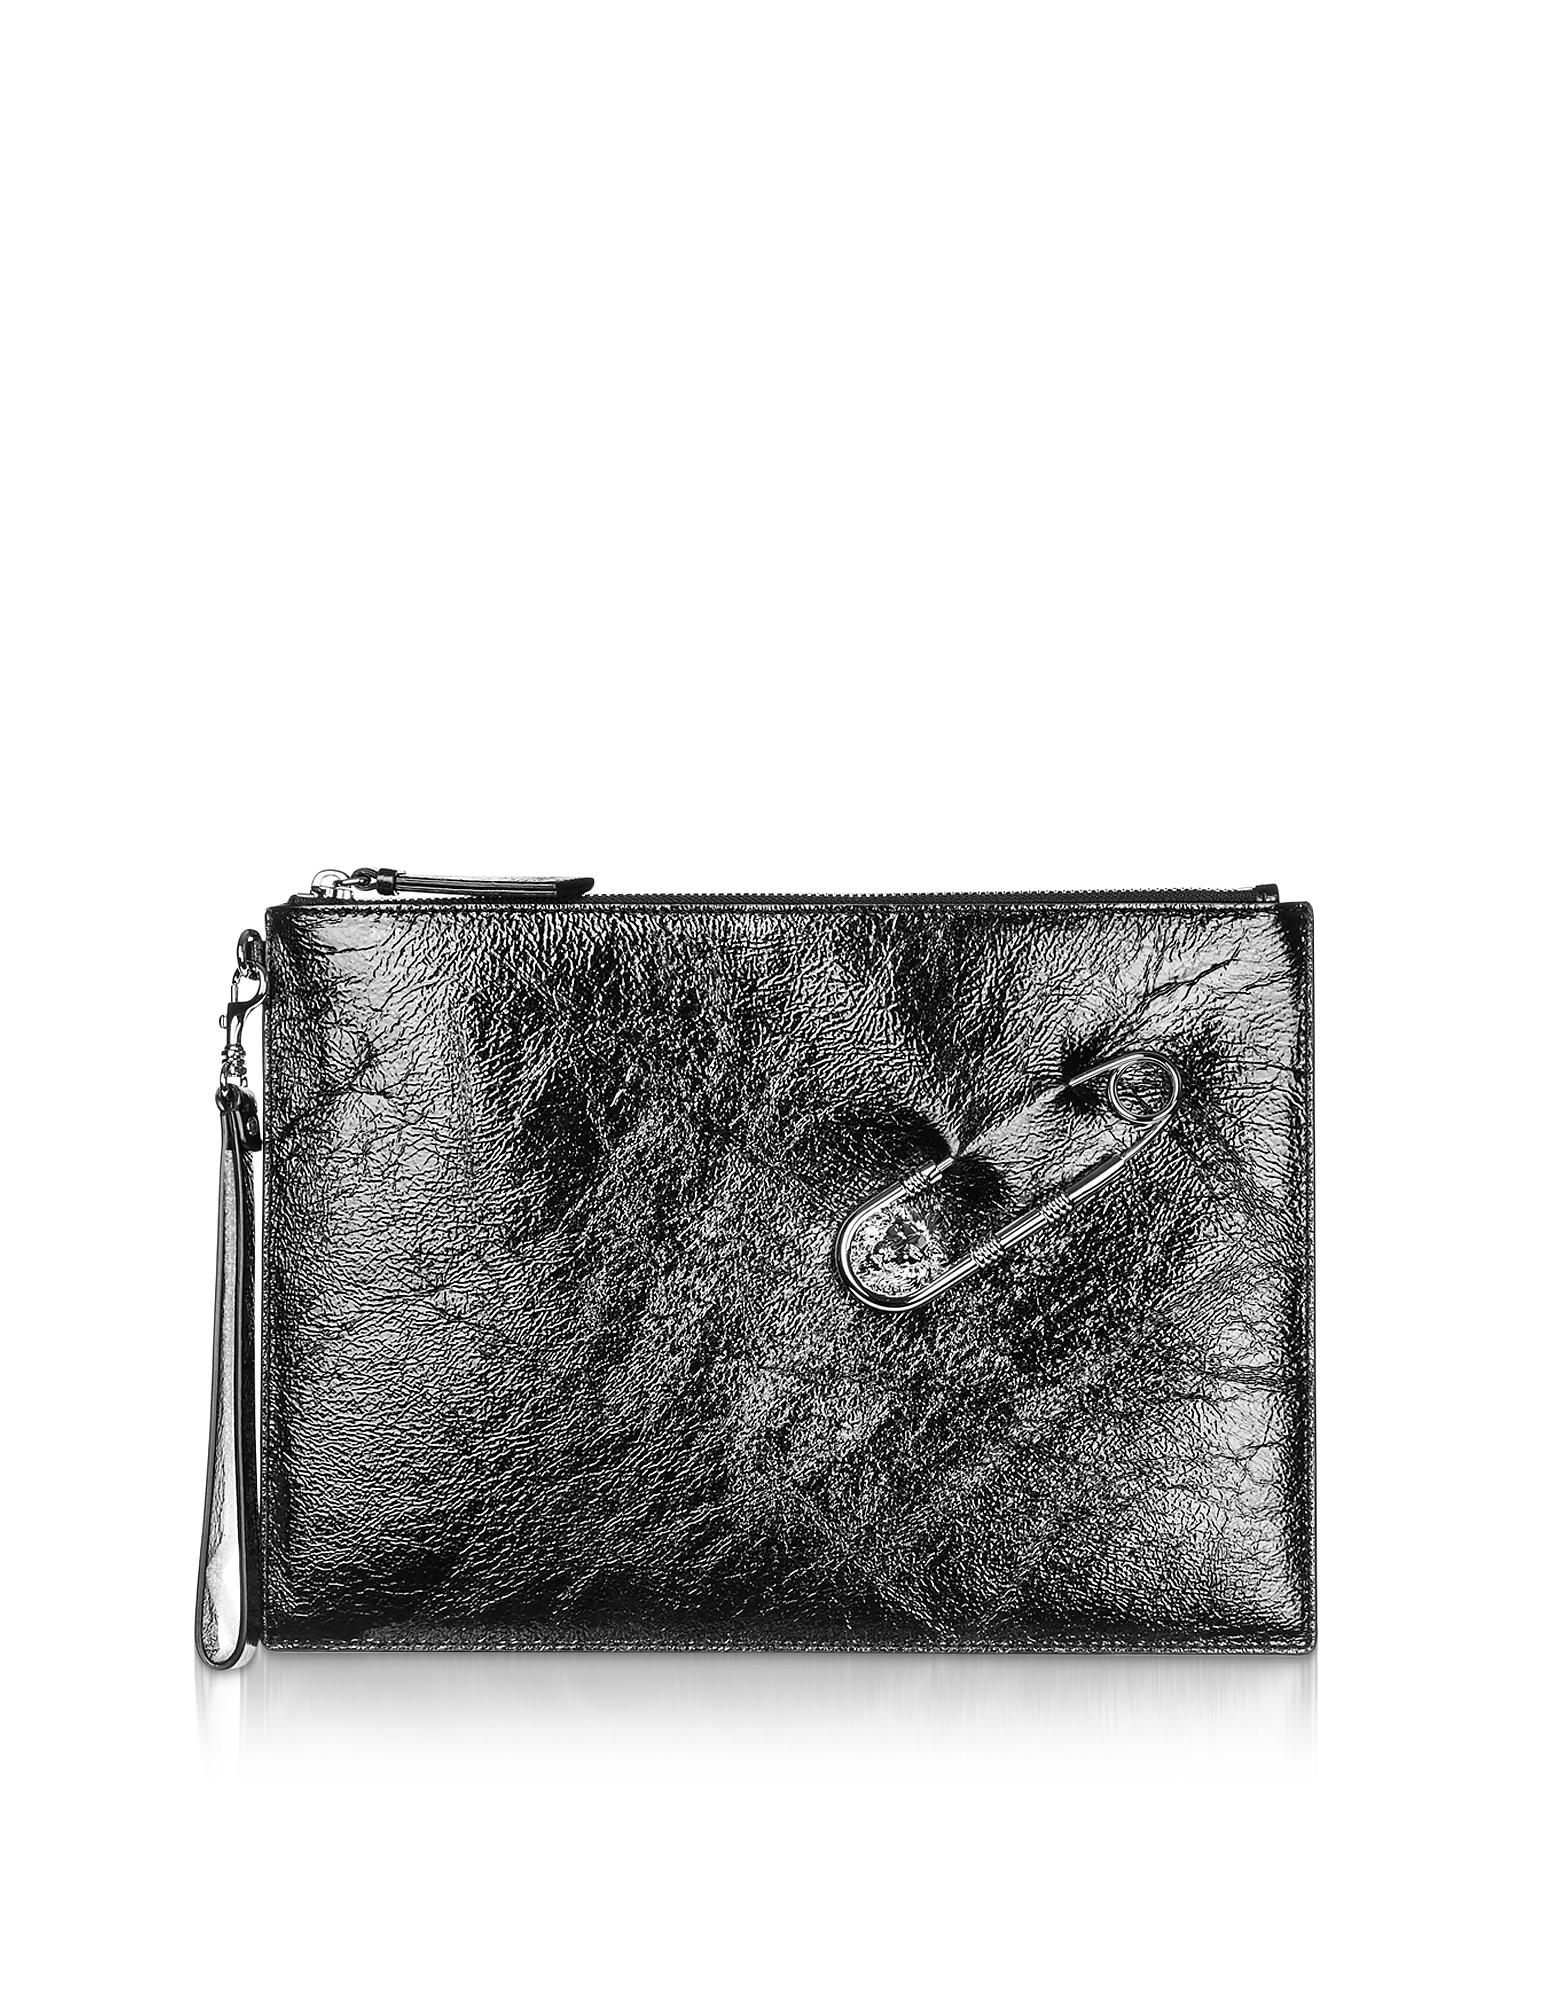 Black Crackle Patent Leather Wallet Clutch